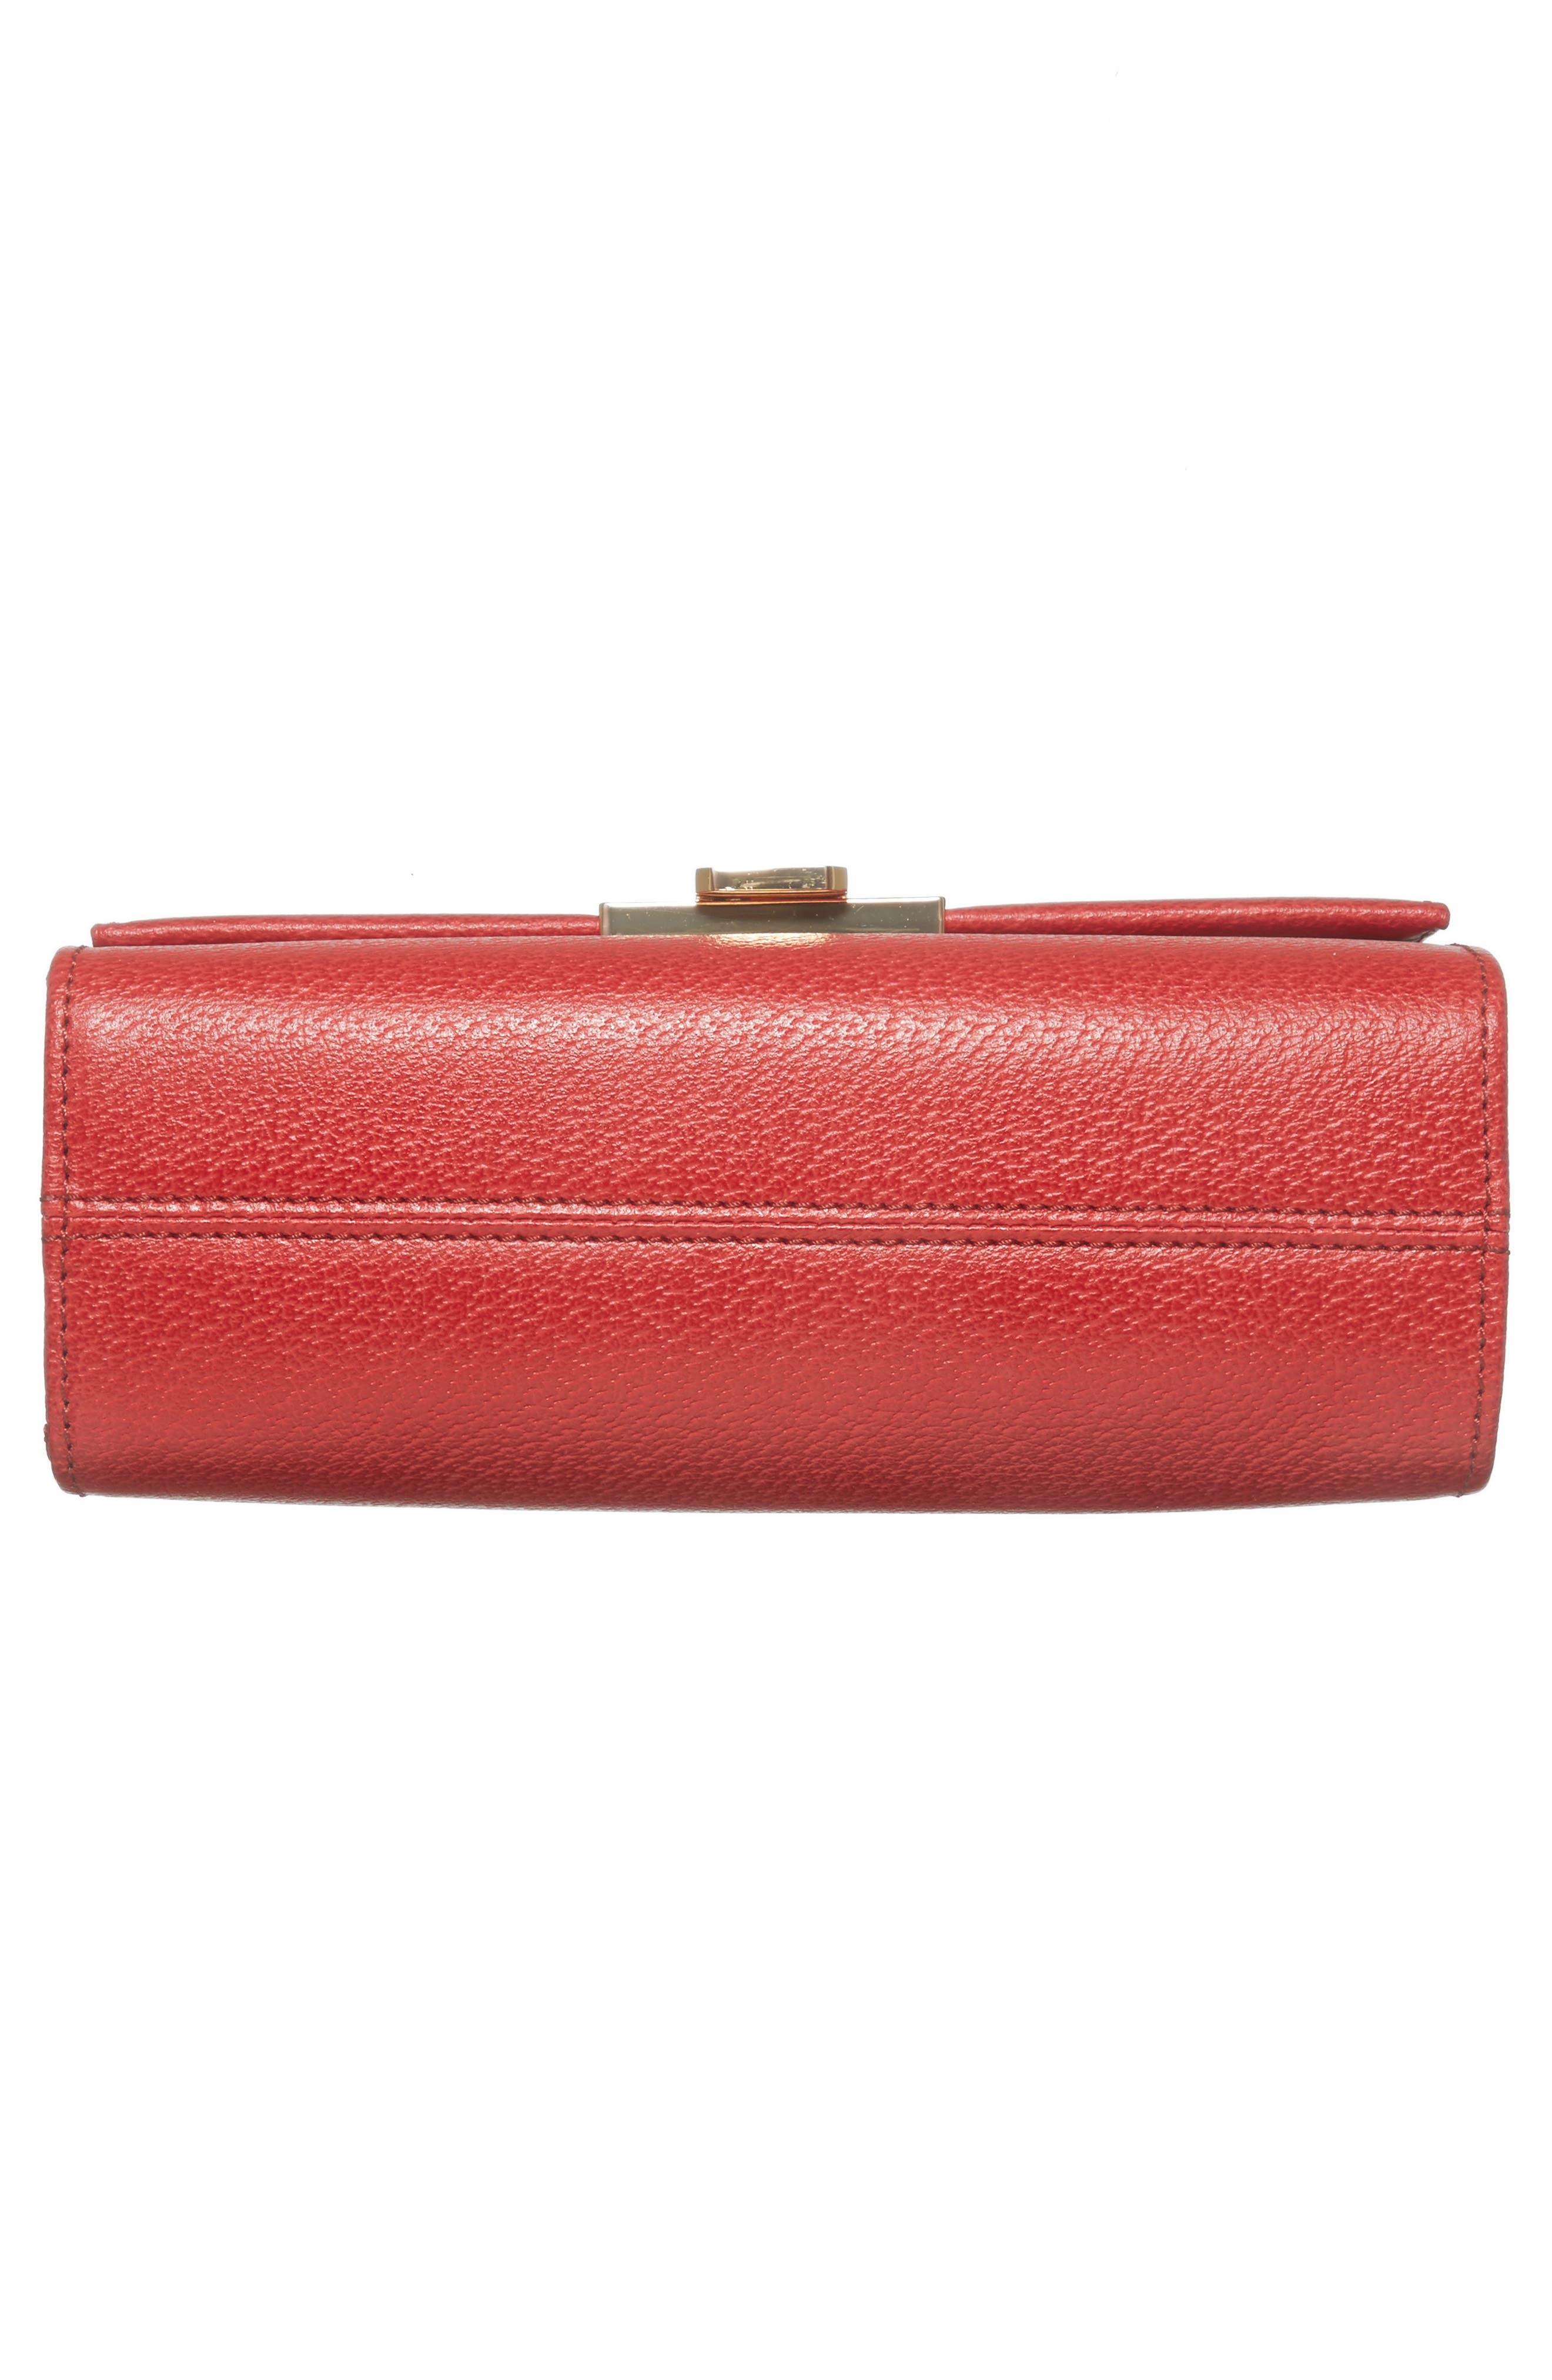 LODIS Stephanie Under Lock & Key - Small Eden Leather Crossbody Bag,                             Alternate thumbnail 6, color,                             600